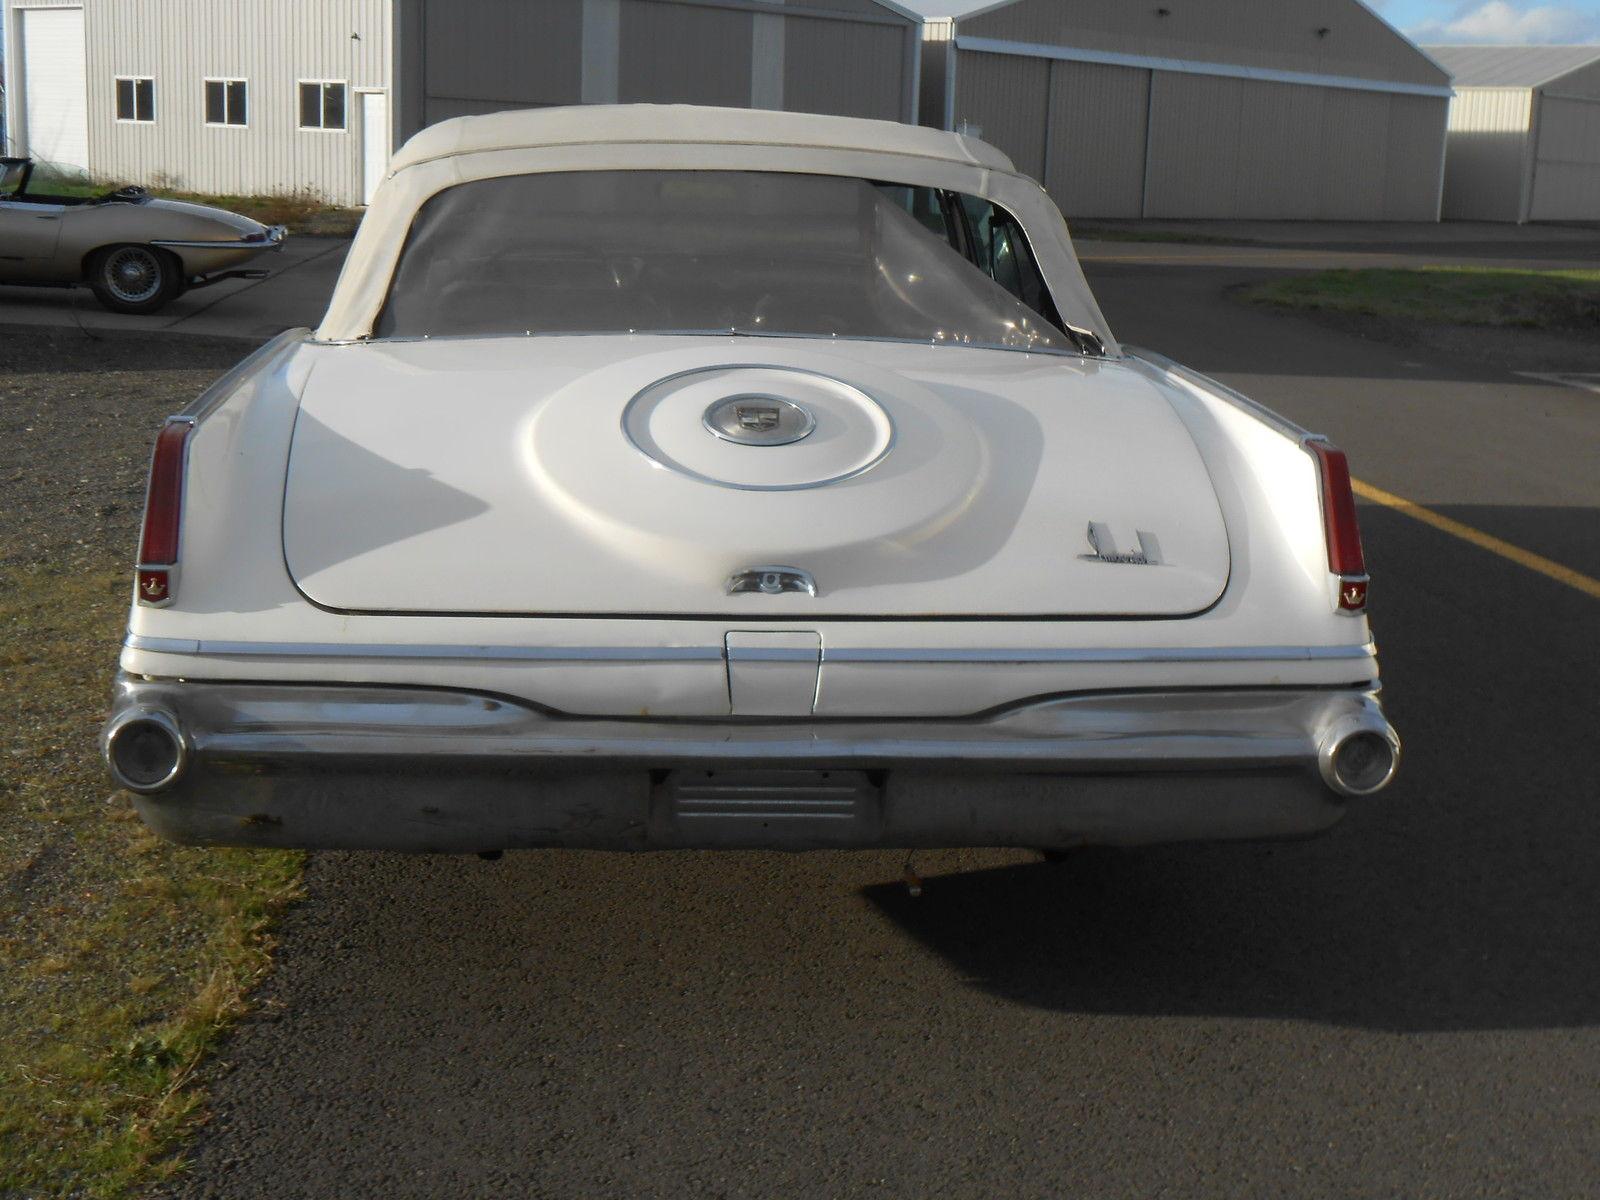 1963 chrysler imperial convertible very nice original car for Oregon department of motor vehicles salem or